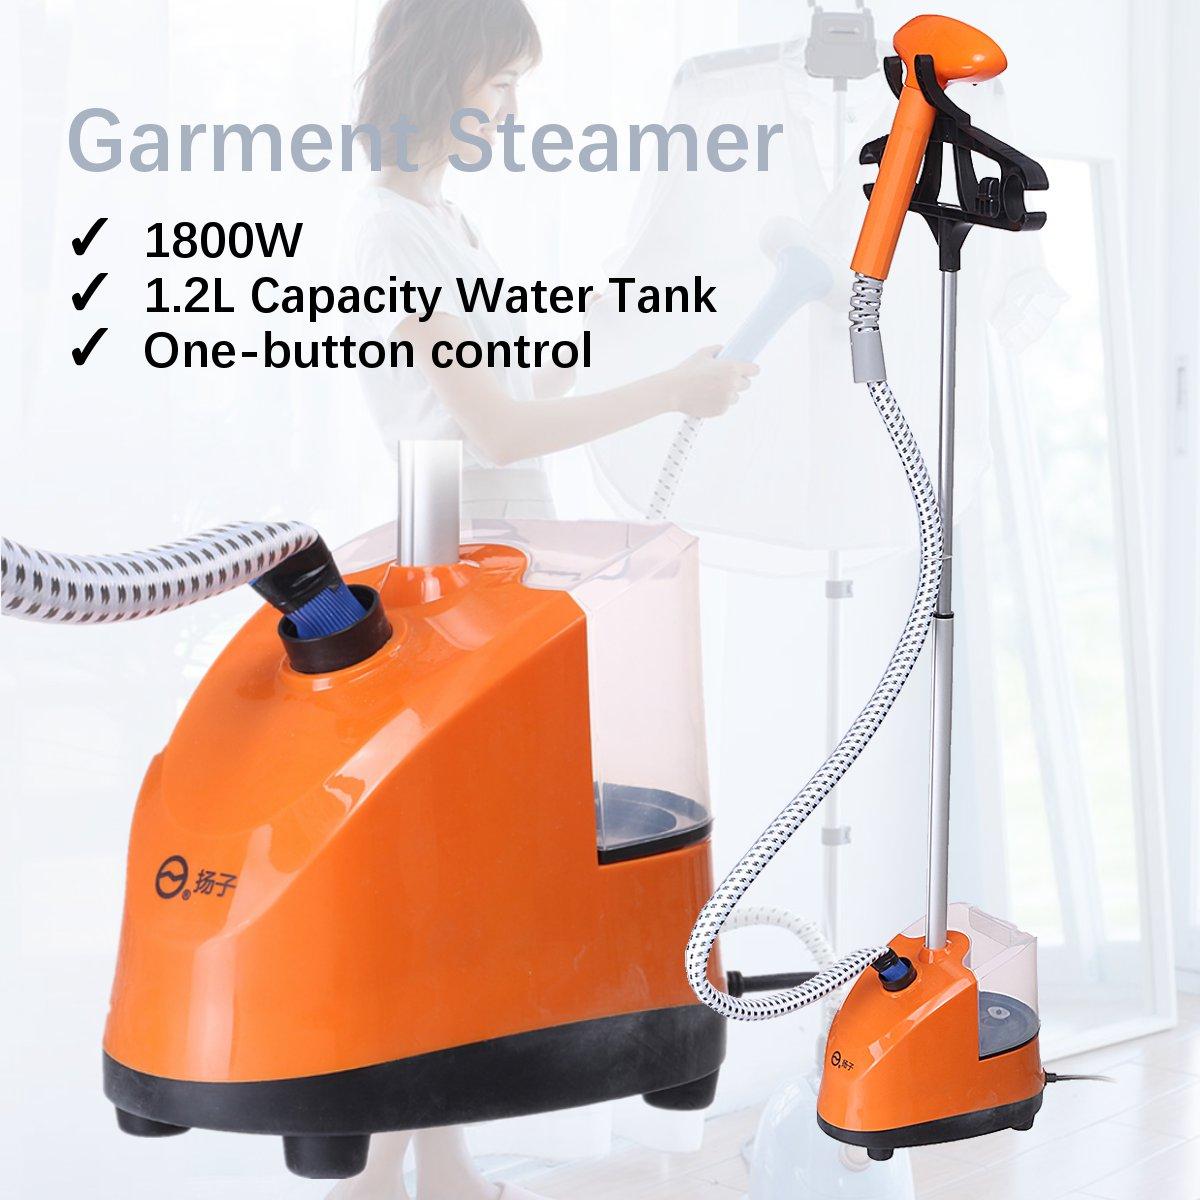 1.2L 1800W Electric Garment Steamer Cloth Fabric Wrinkle Ironing Machine Hanger Heat Water Tank Hanging Steamer Machine 220V